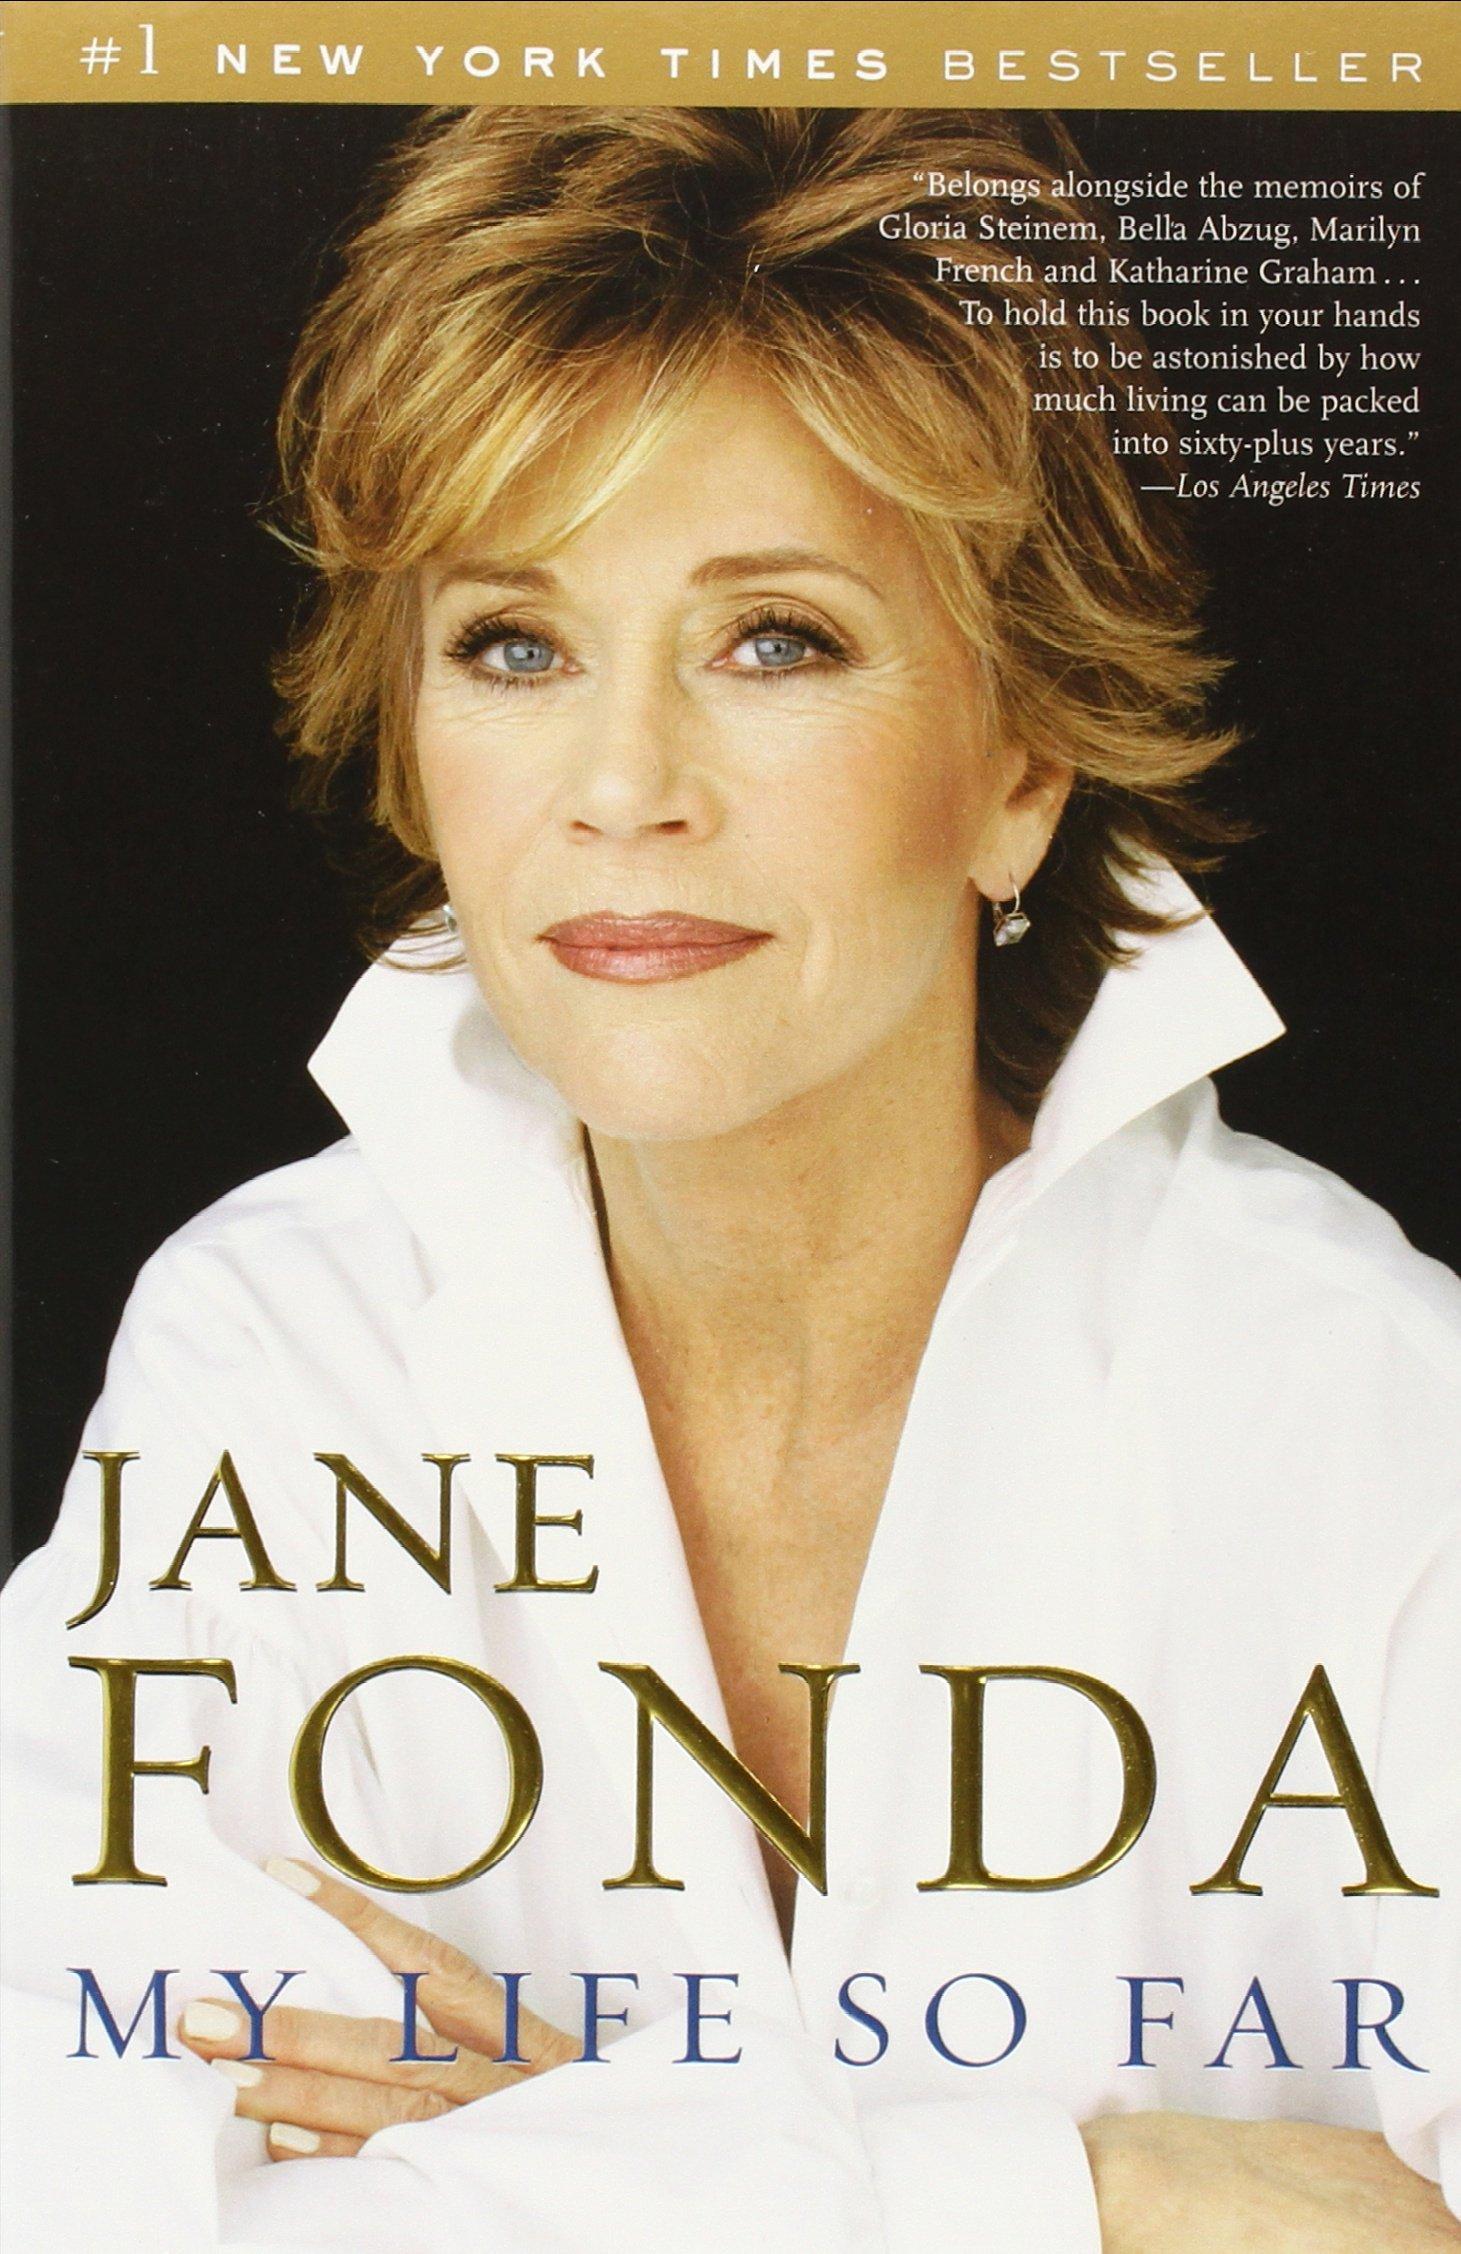 My Life So Far: Jane Fonda: 9780812975765: Amazon.com: Books